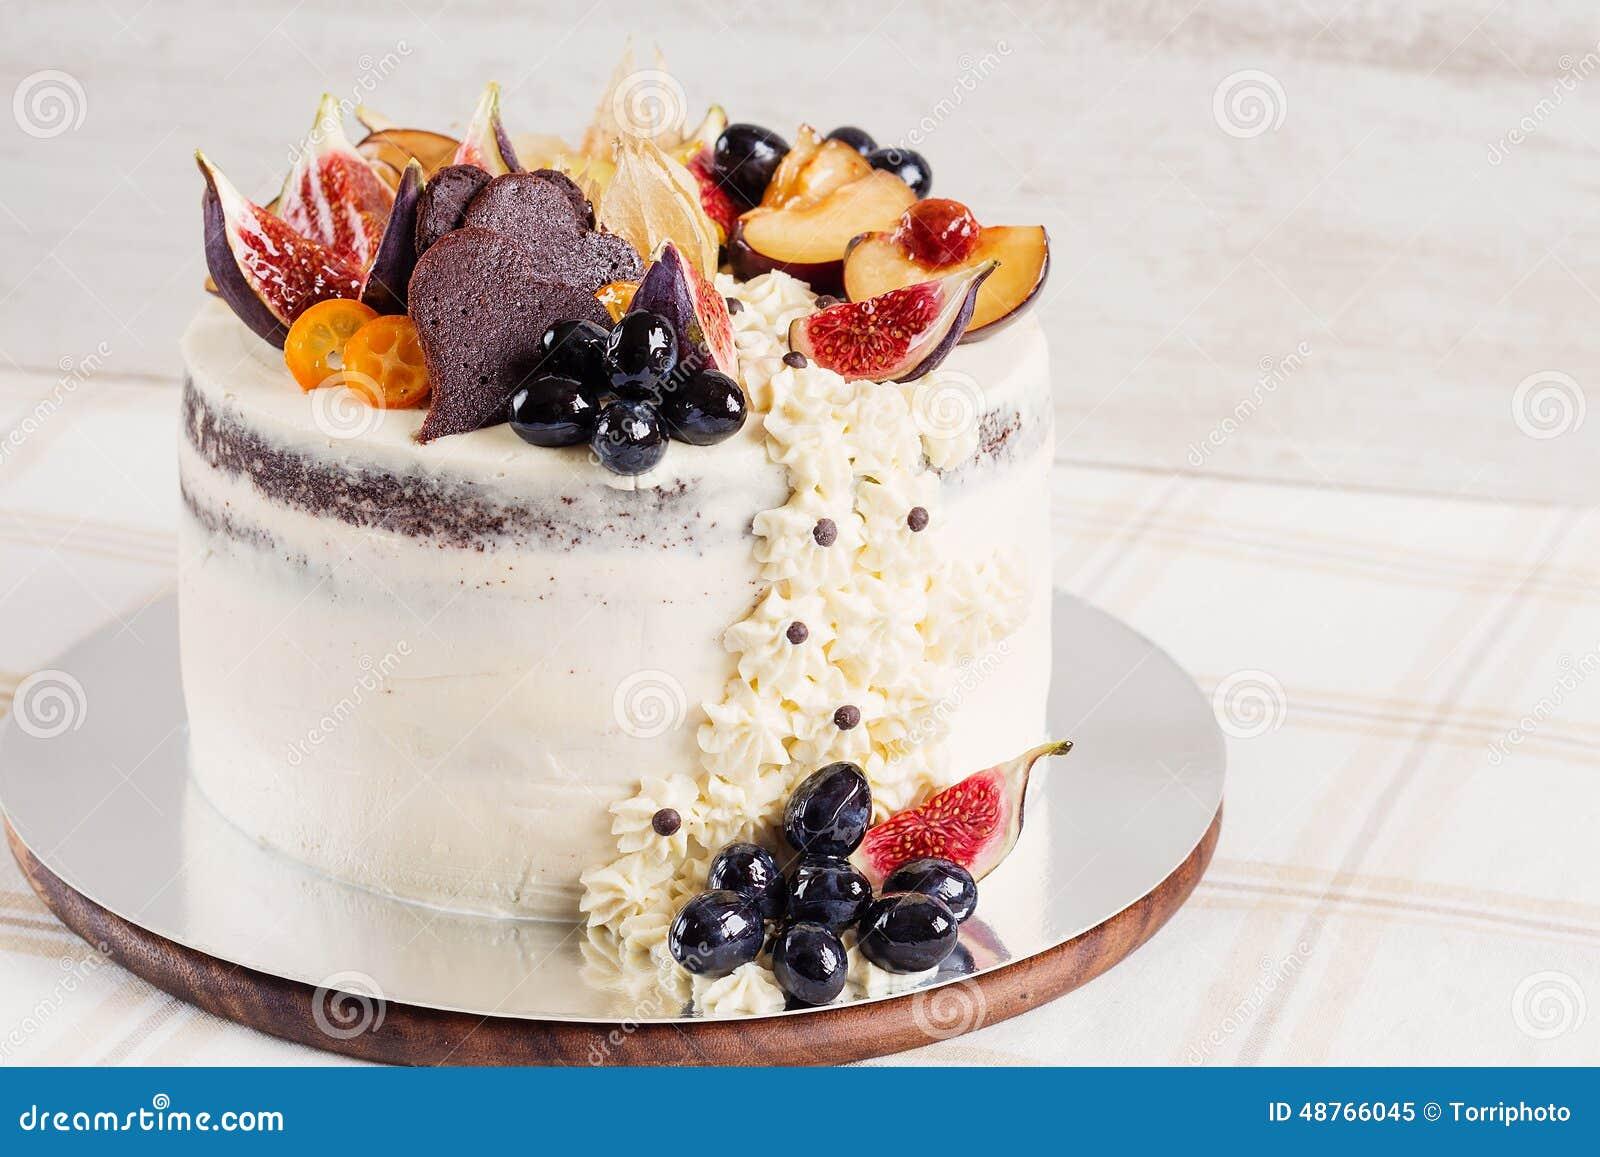 Rustic wedding cake stock image. Image of layer, heart - 48766045